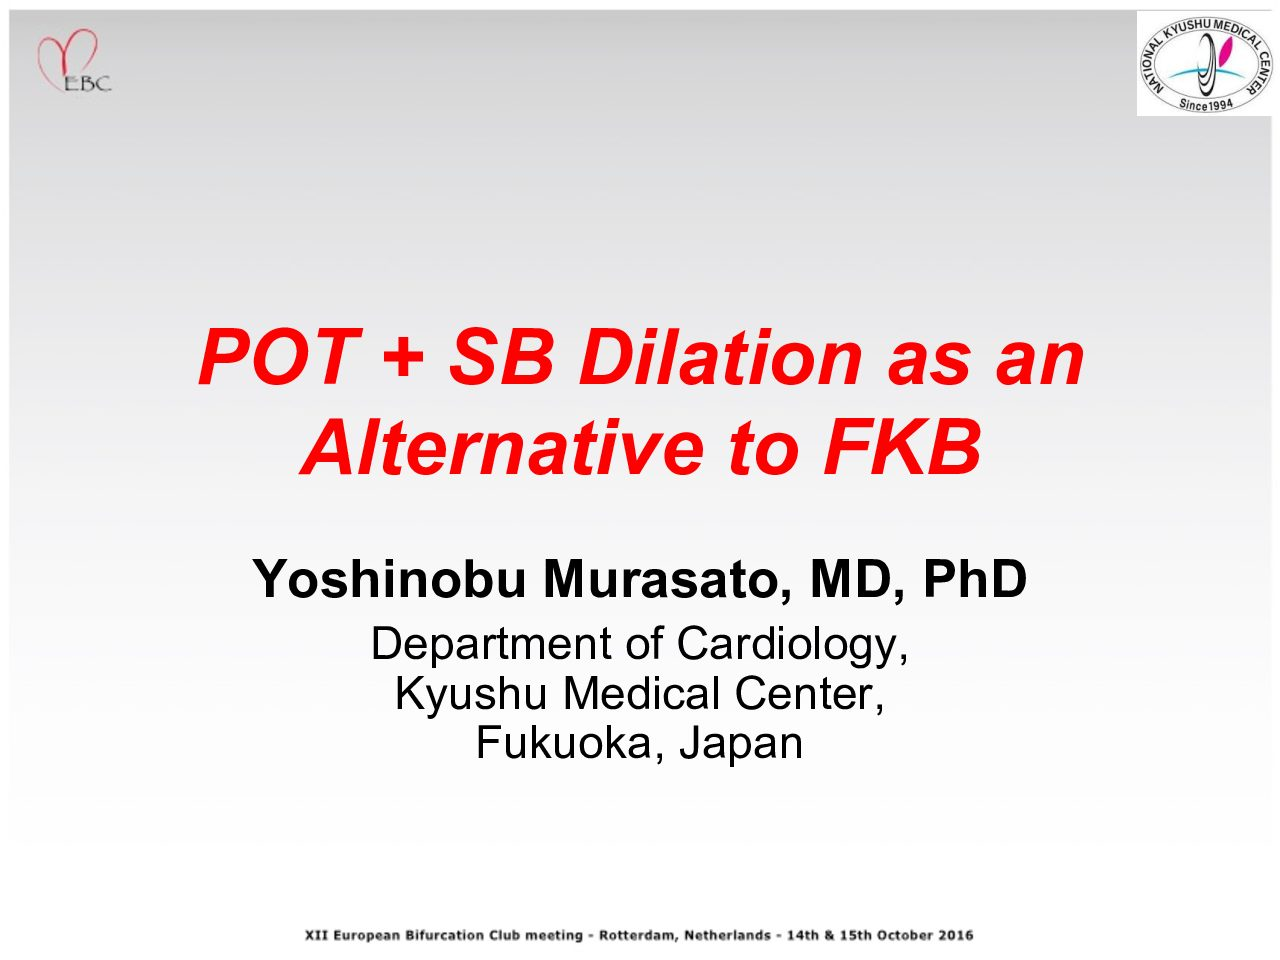 POT + SB Dilation as an Alternative to FKB